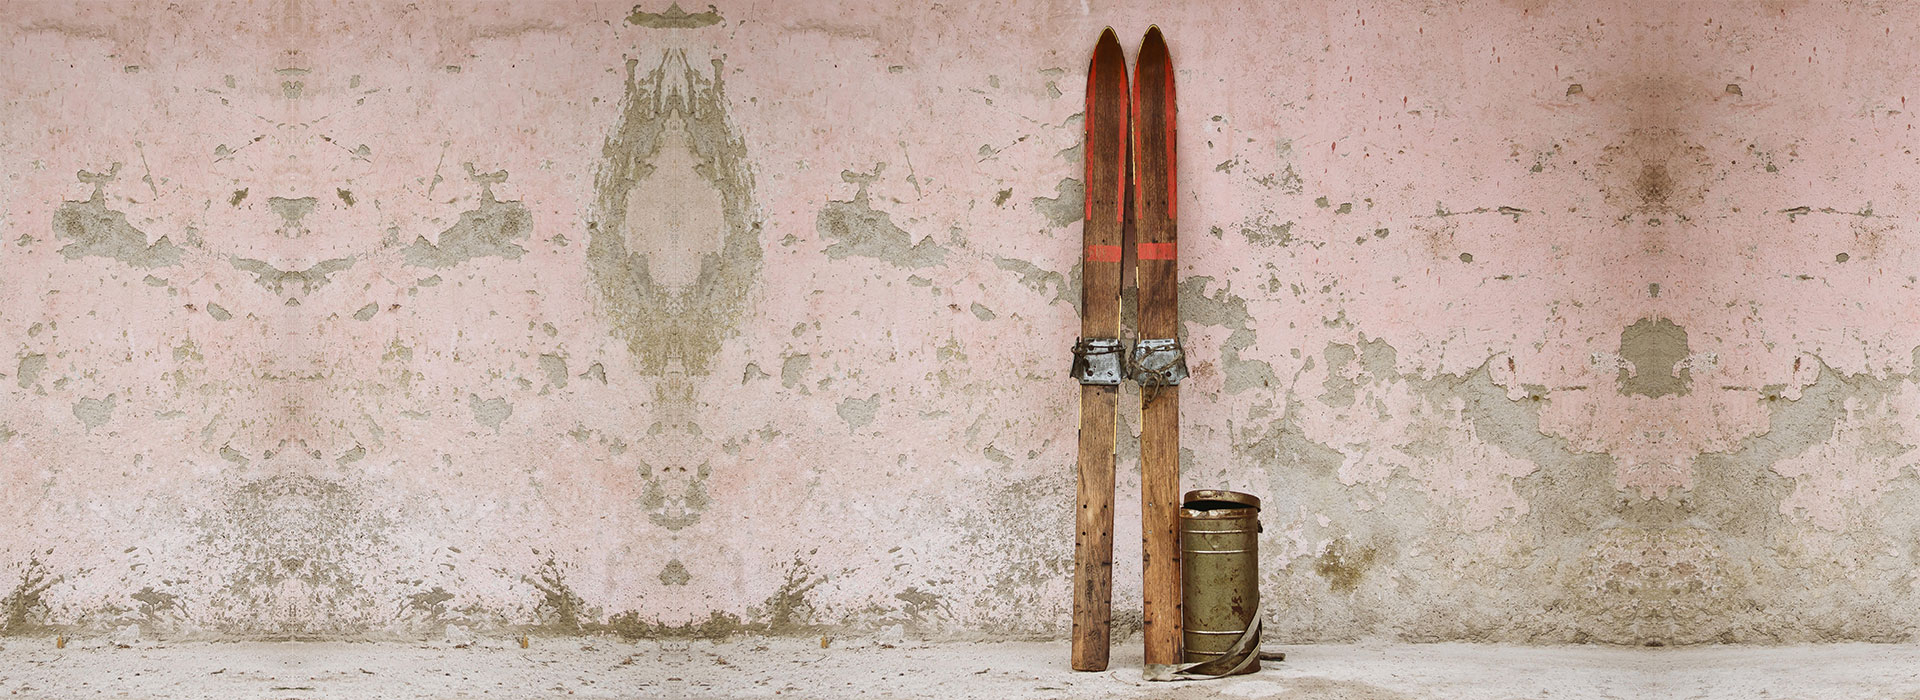 f86431843bff9 Antique Ski Shop